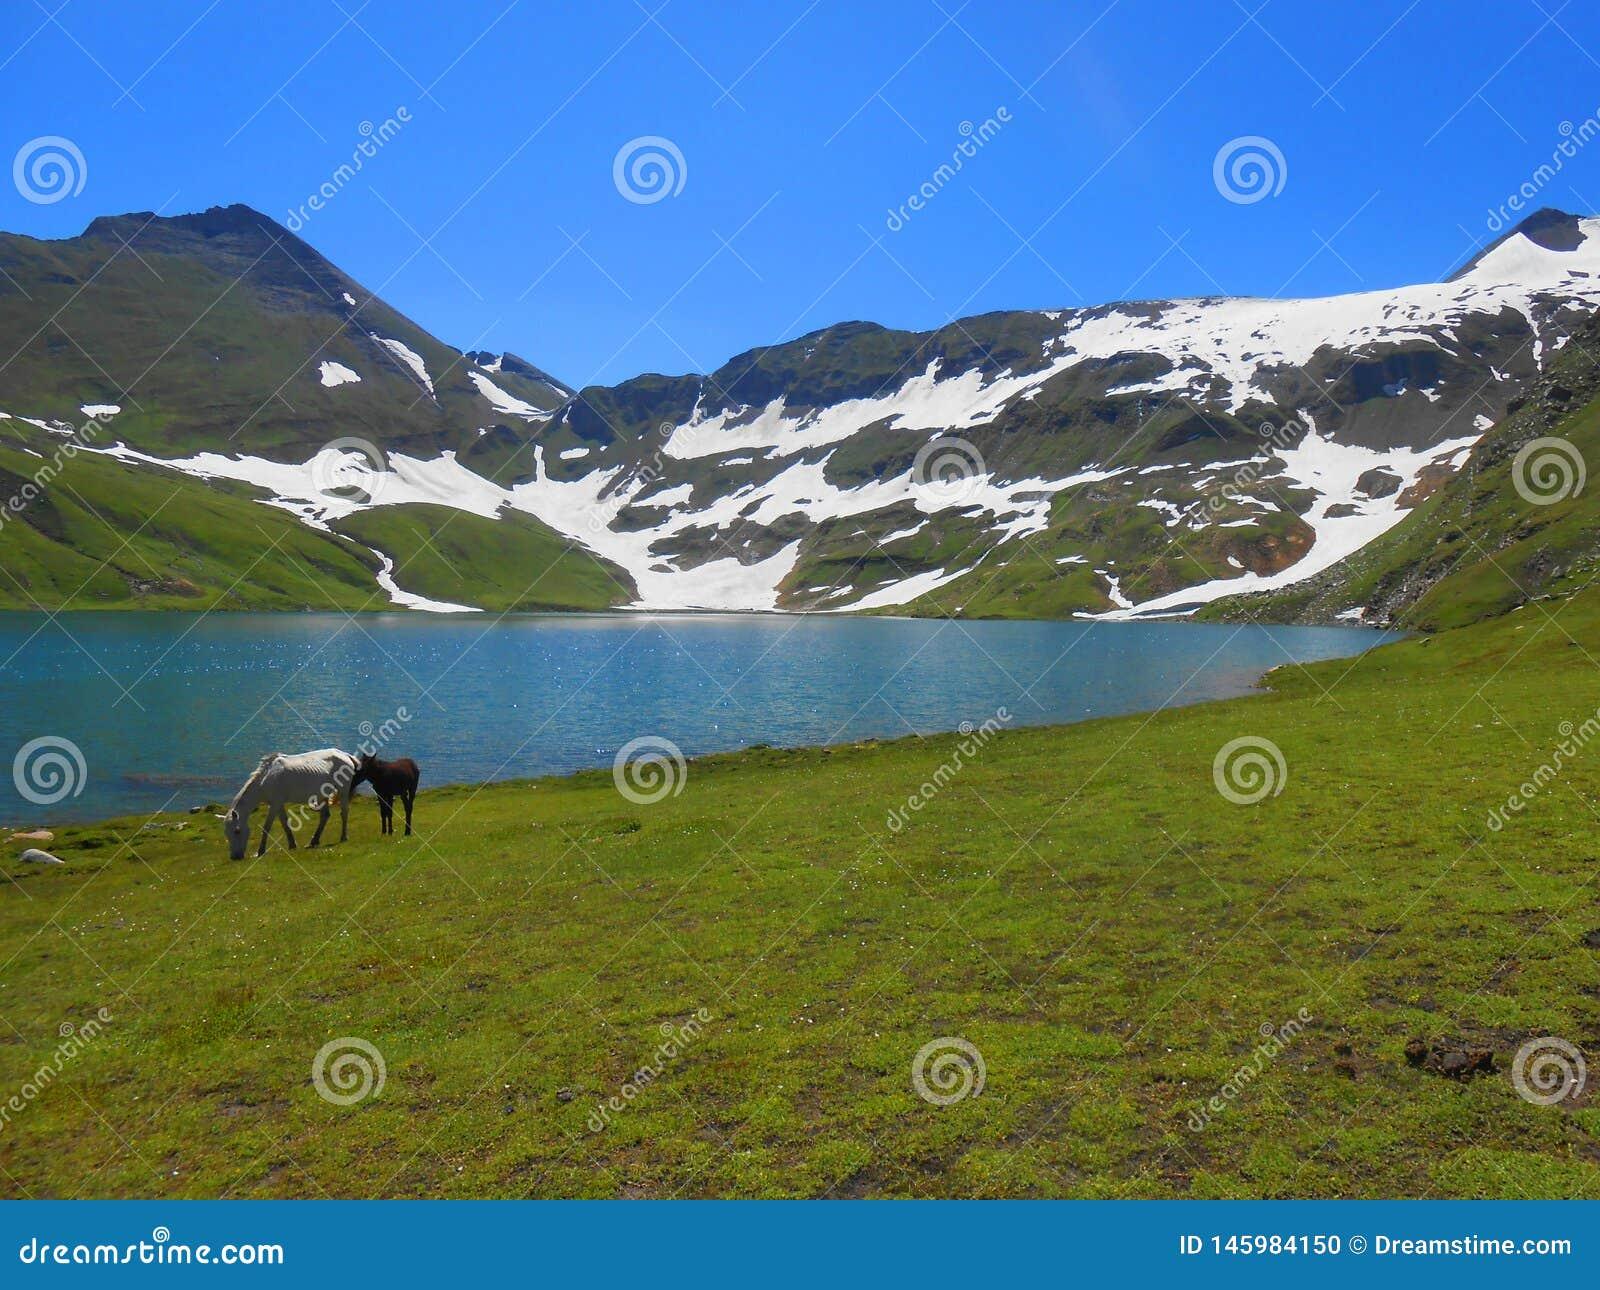 Dusdhipatsar Lake beautiful view with Horses